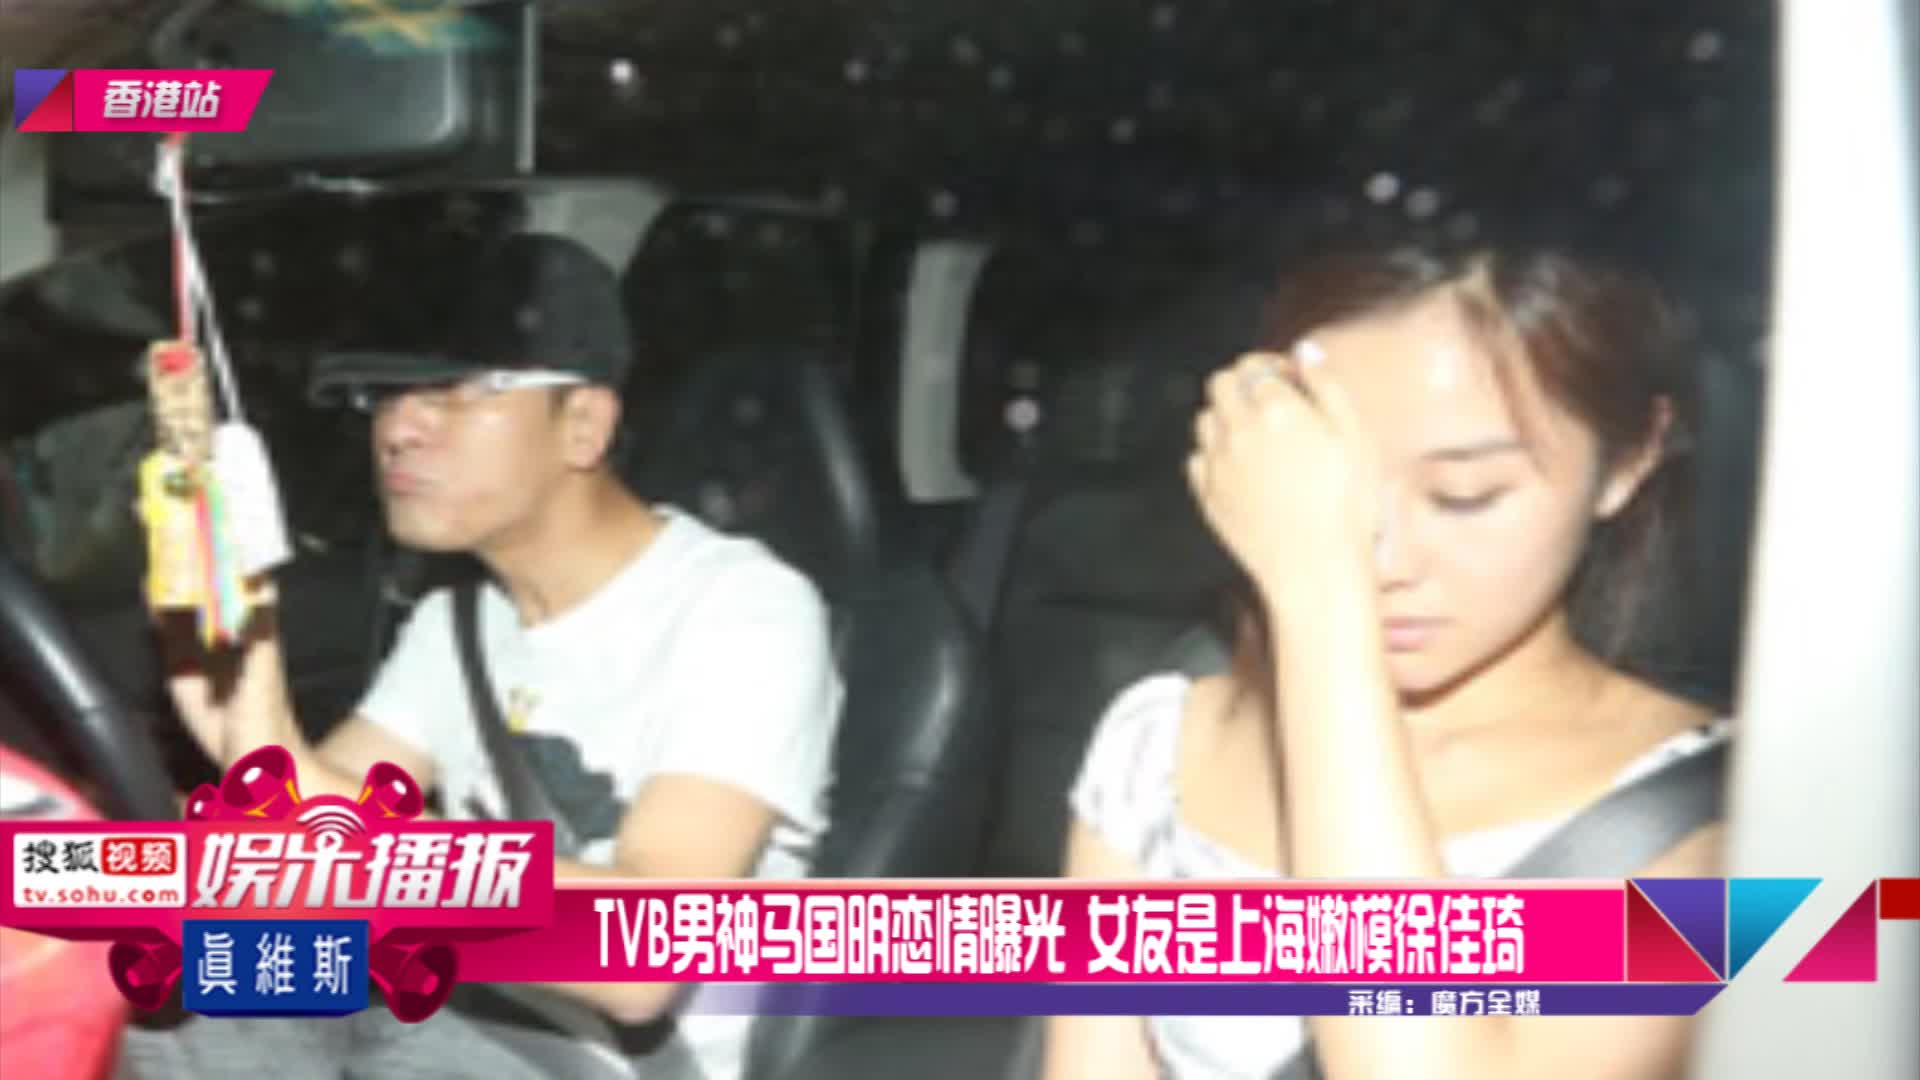 TVB男神马国明恋情曝光 女友是上海嫩模徐佳琦